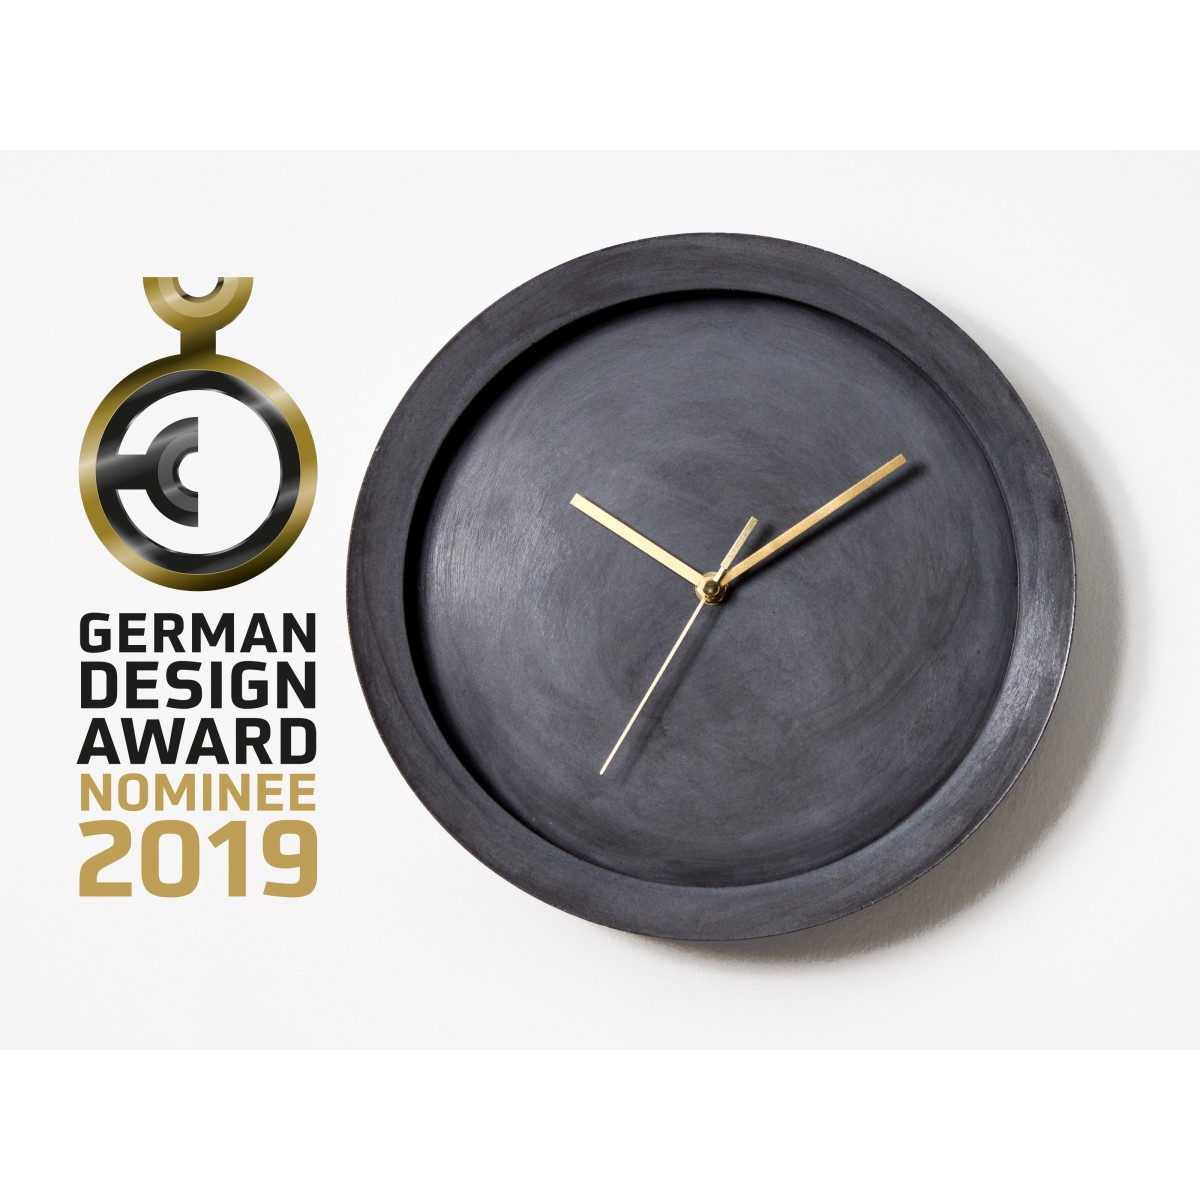 Beton Wanduhr Ovisproducts - moderne Uhr